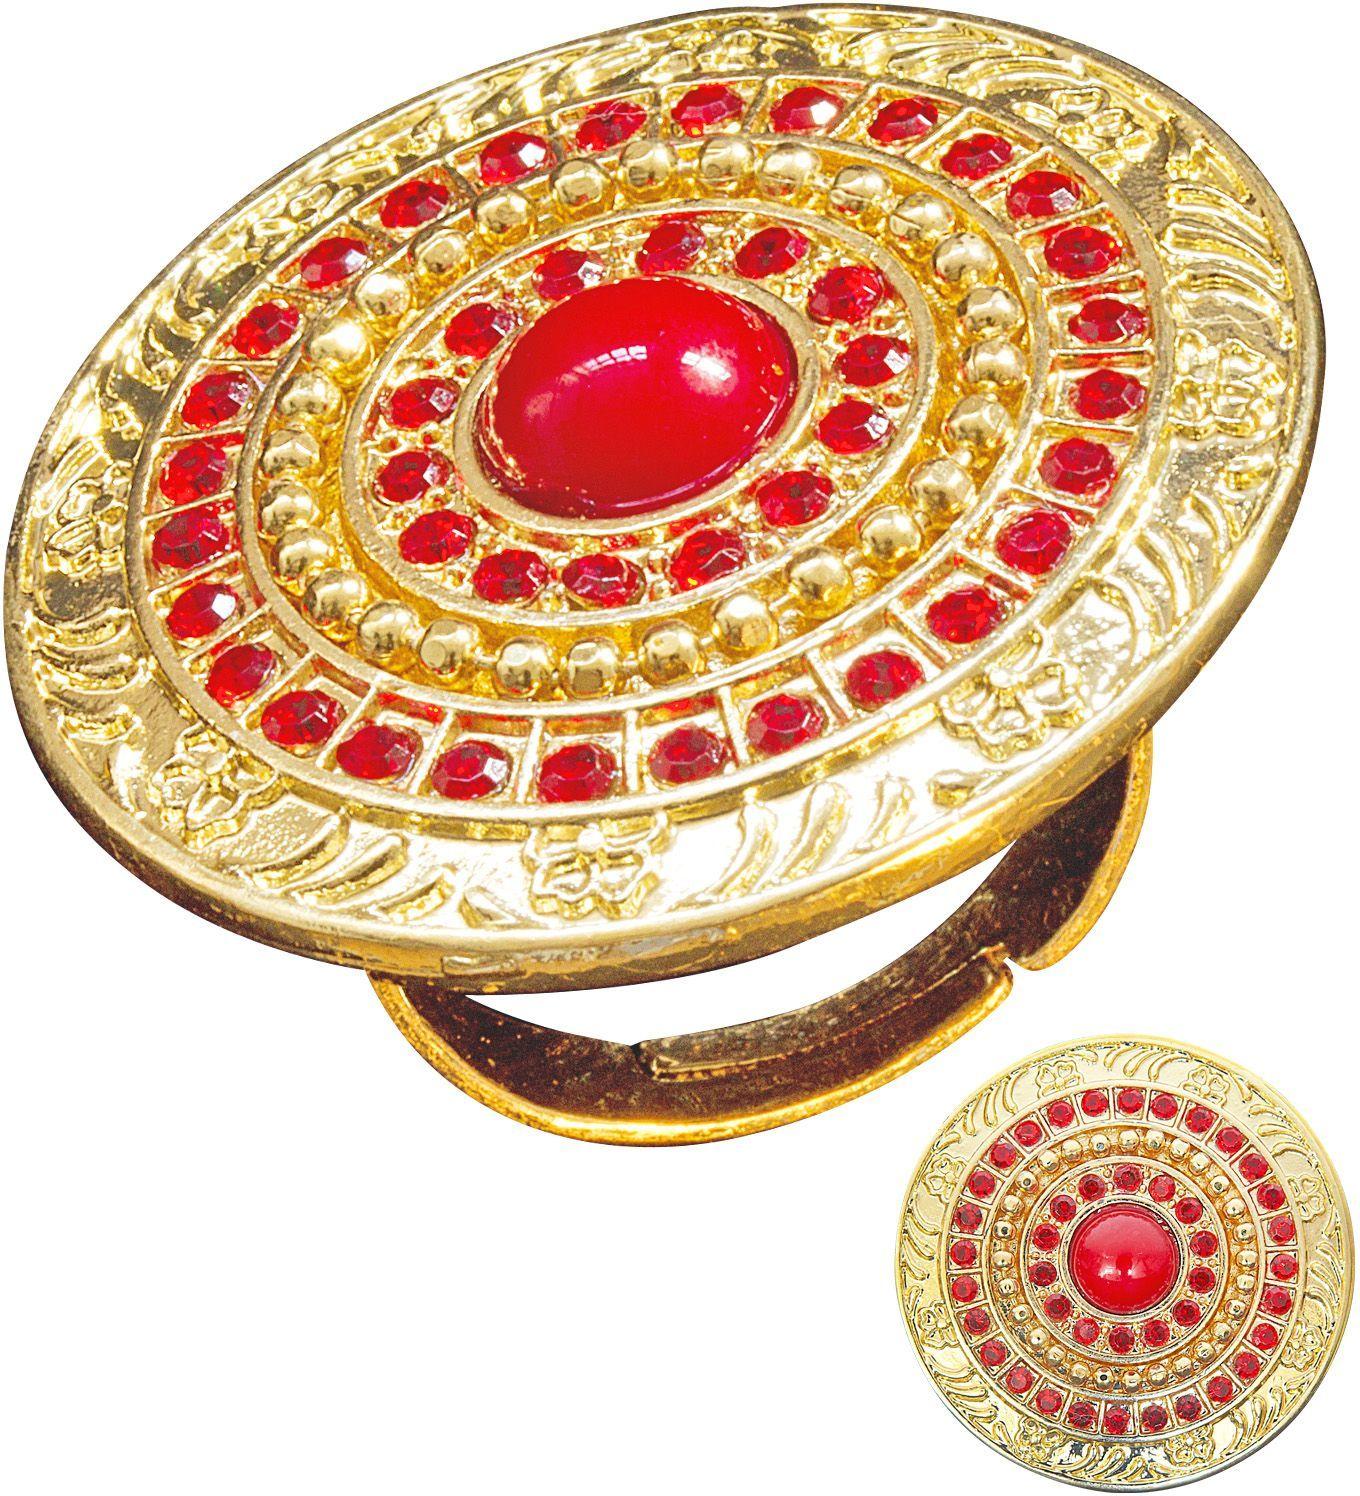 Romeinse ring